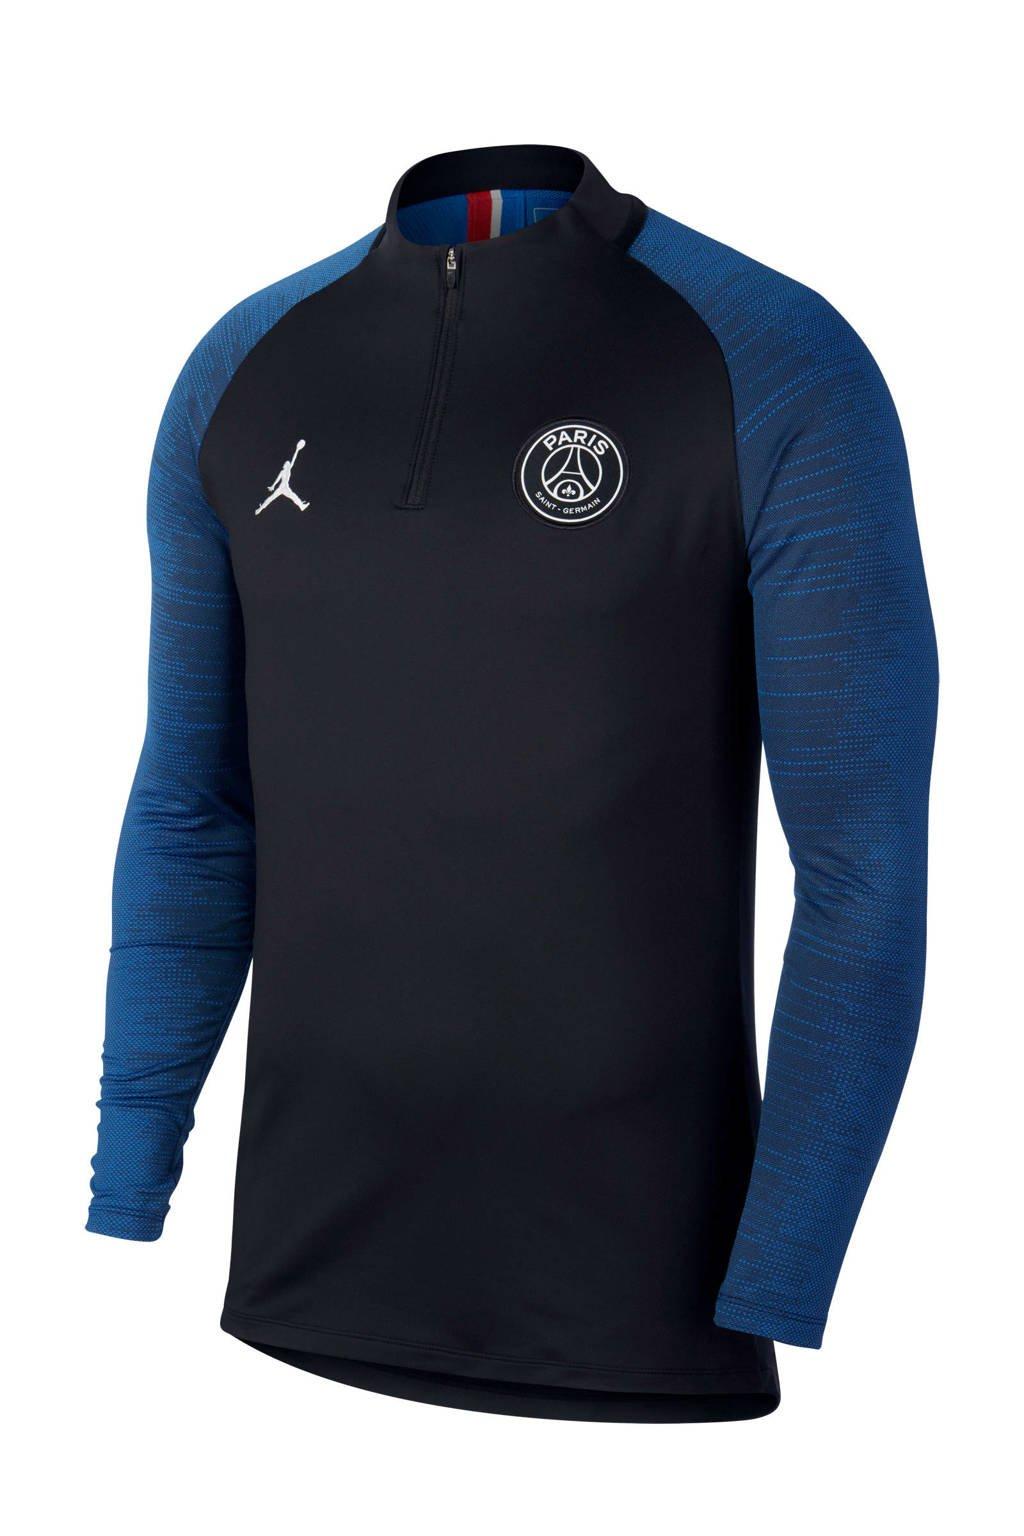 Nike Senior Paris Saint Germain voetbalshirt x Jordan, Zwart/blauw